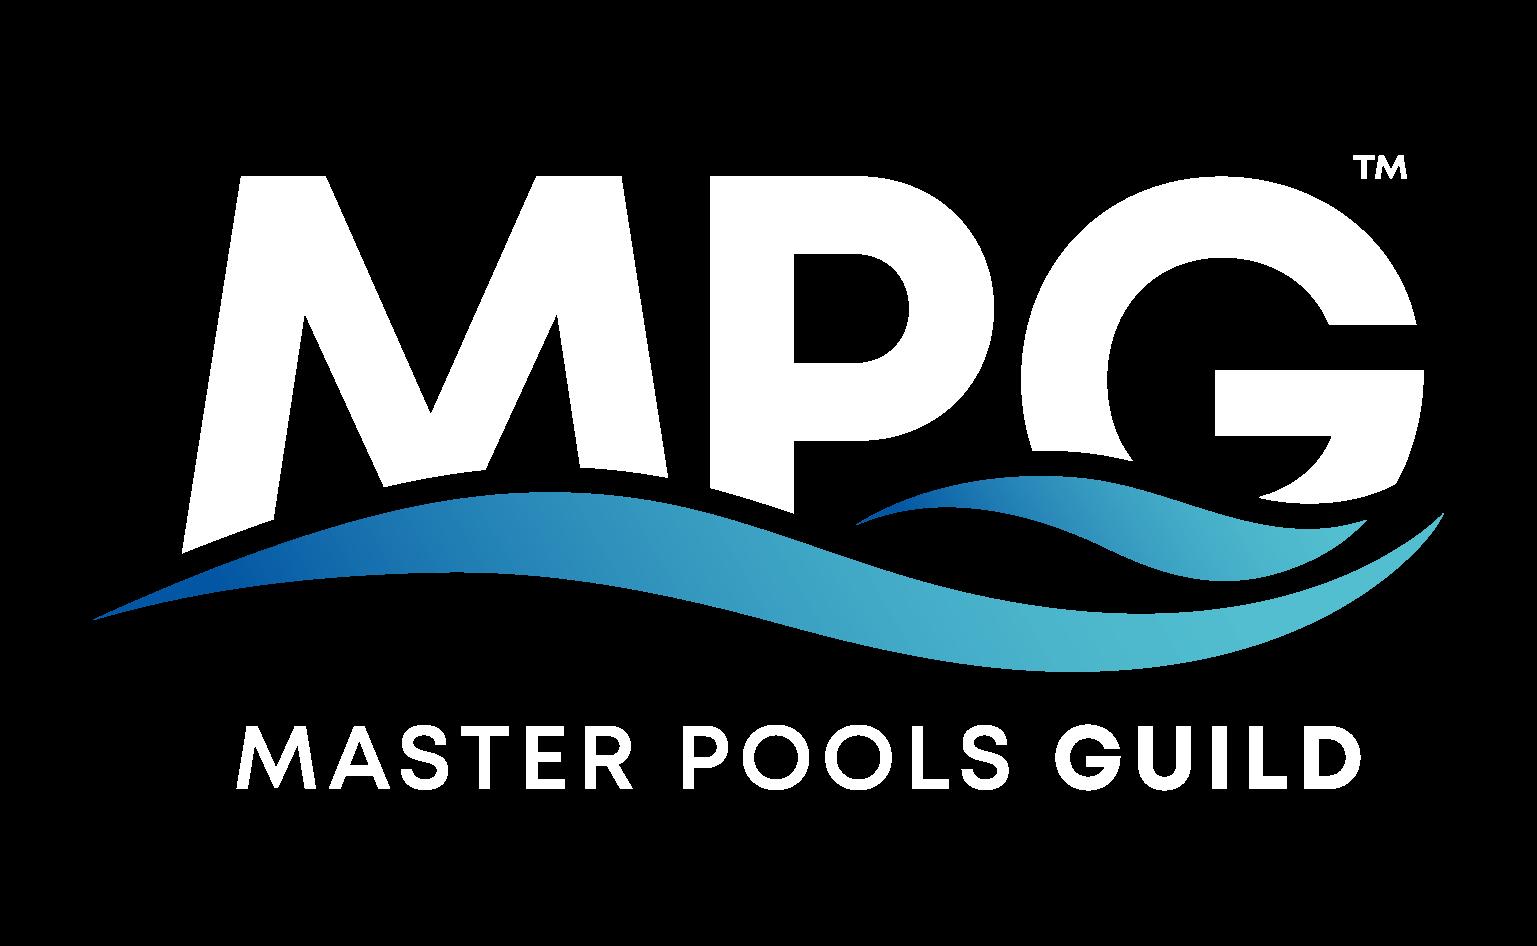 Master Pools Guild Logo